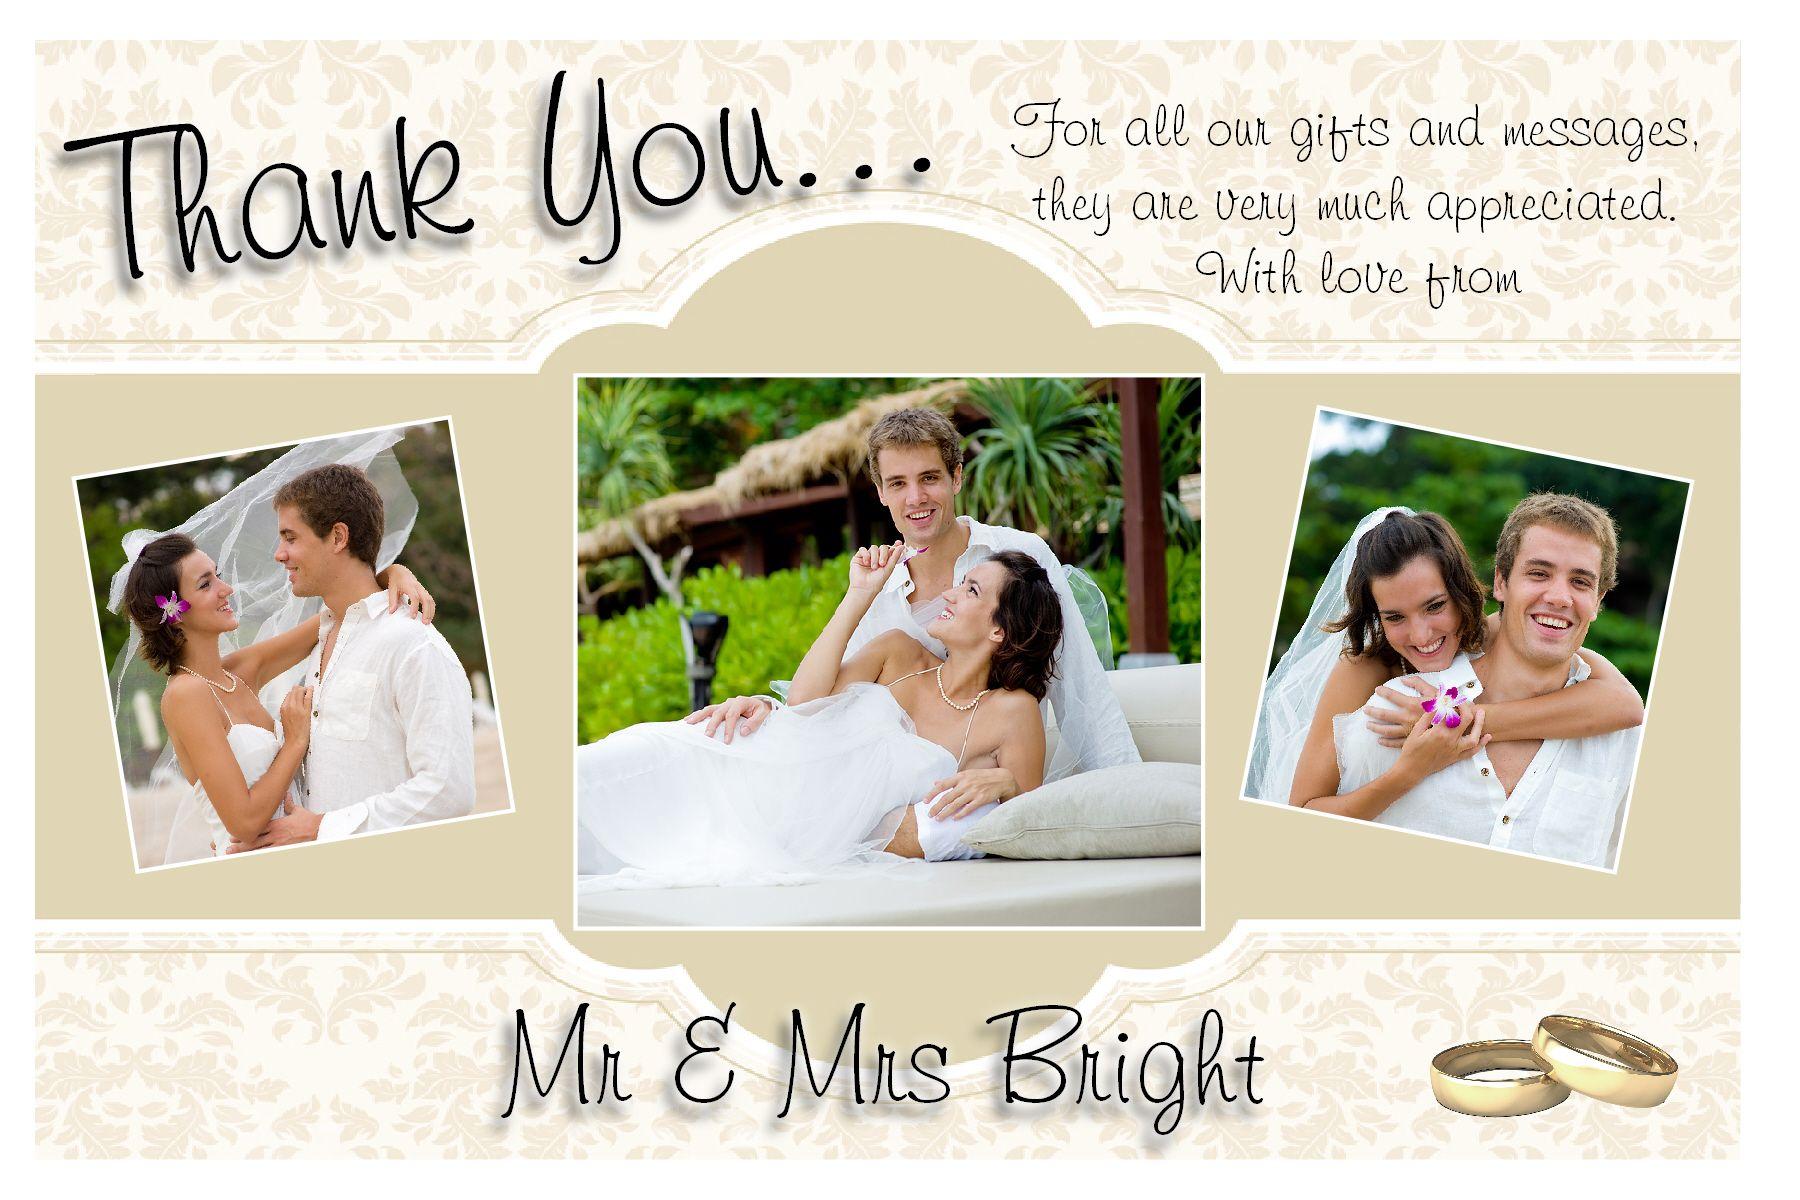 wedding thank you quotes quotesgram